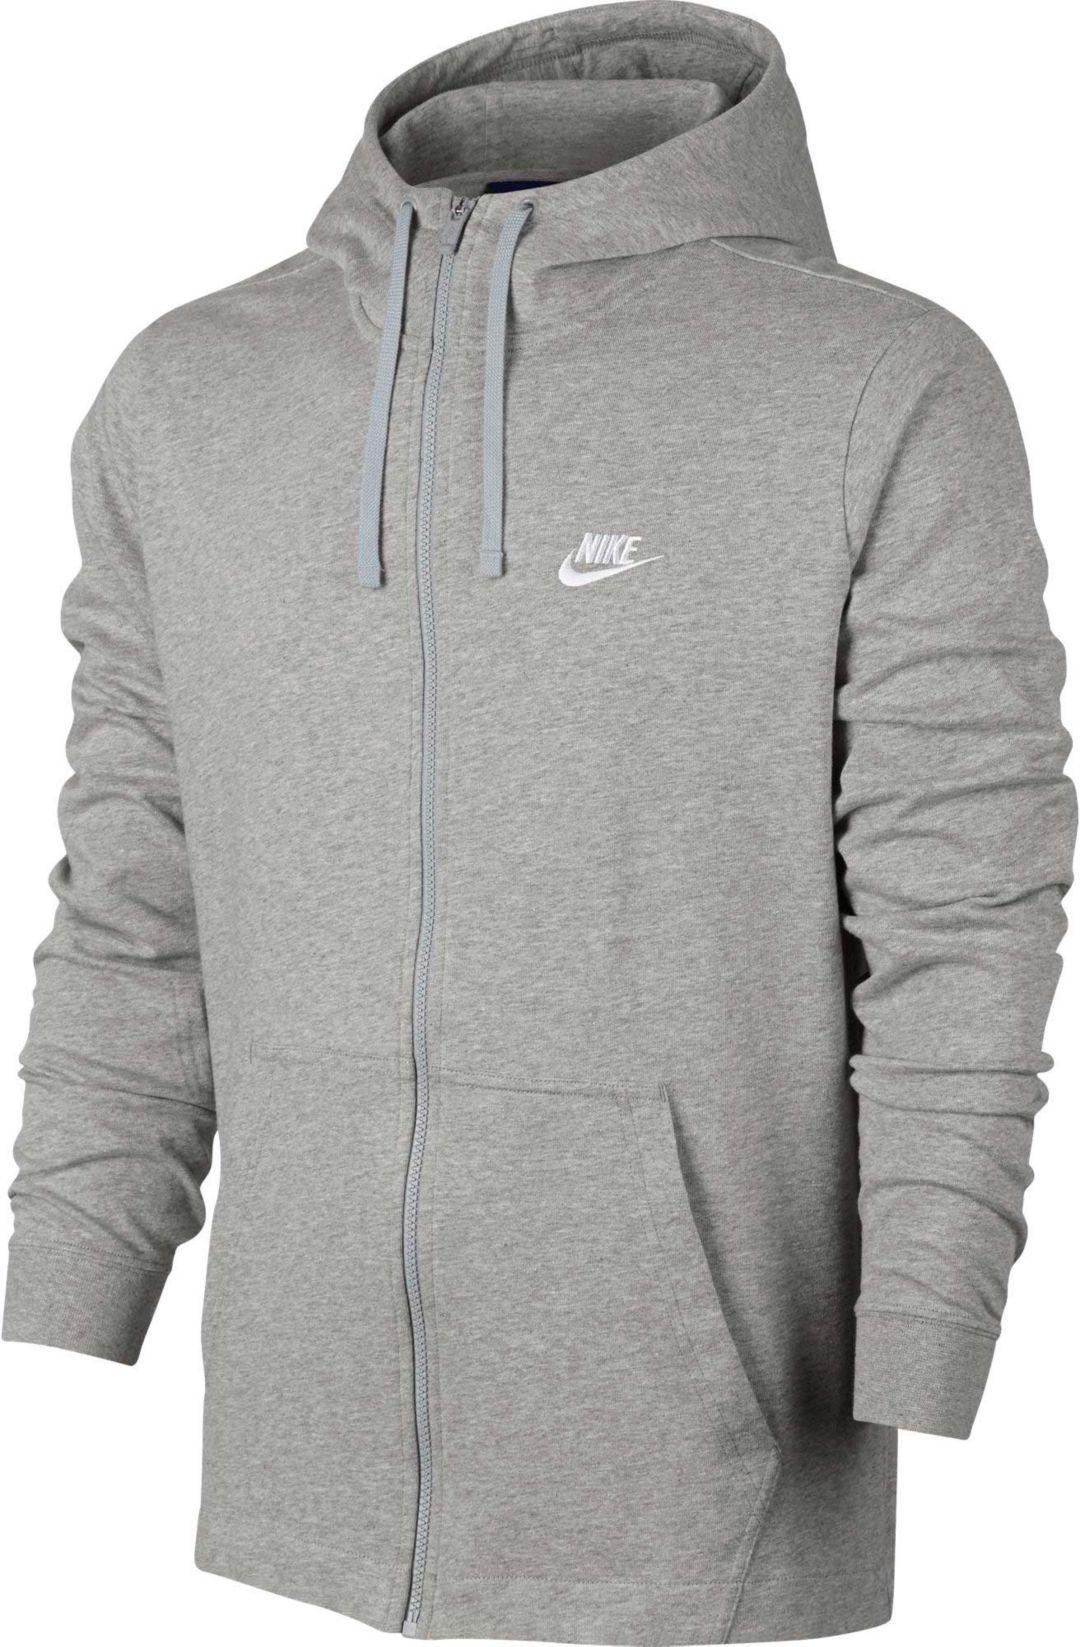 df3e773dc1 Nike Men's Sportswear Full-Zip Hoodie | DICK'S Sporting Goods